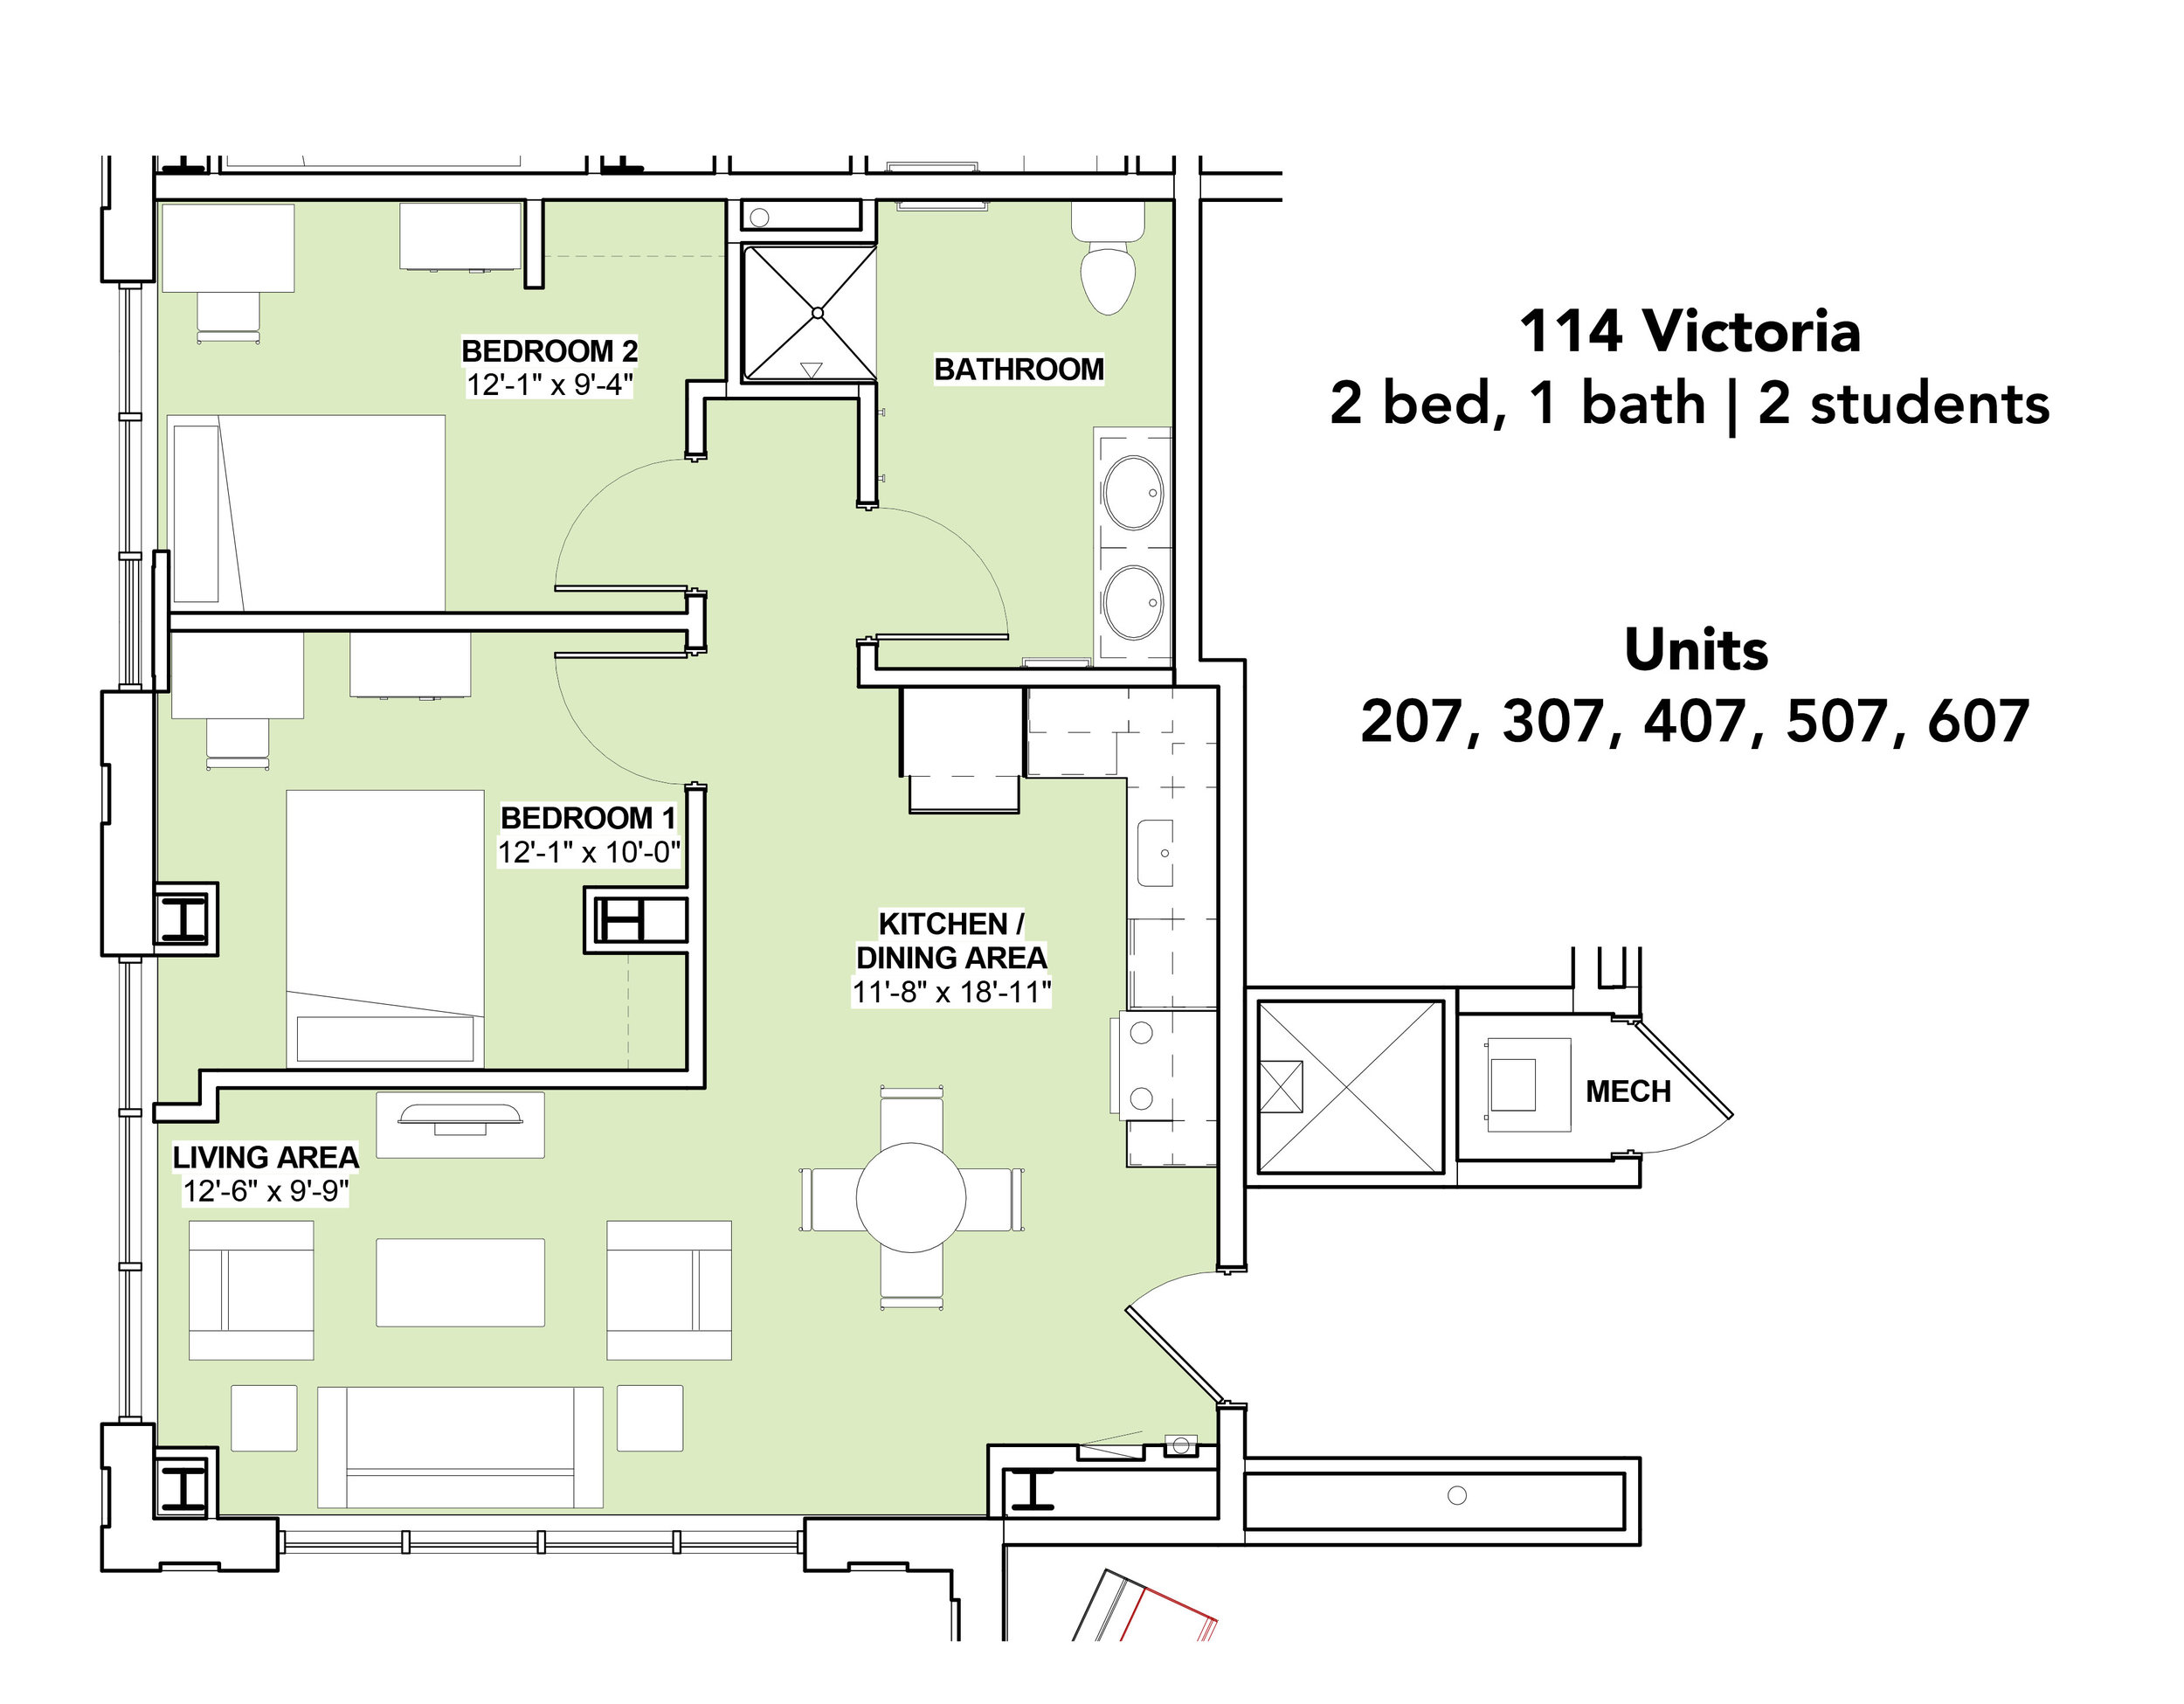 114 Victoria 2 bed 2 student.jpg